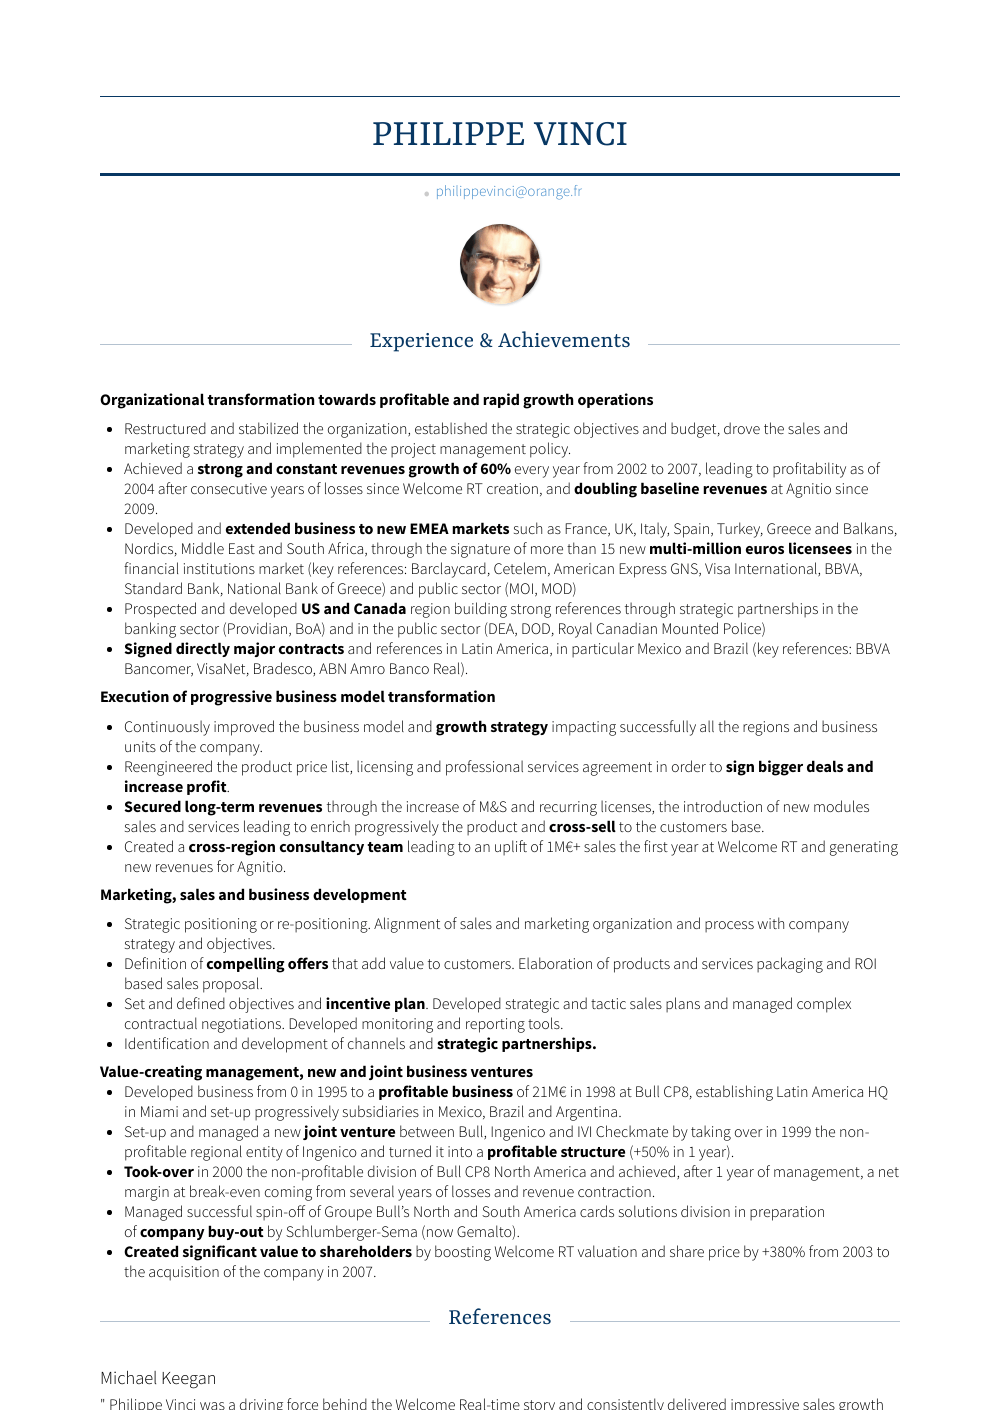 Founder And Managing Partner Resume Sample